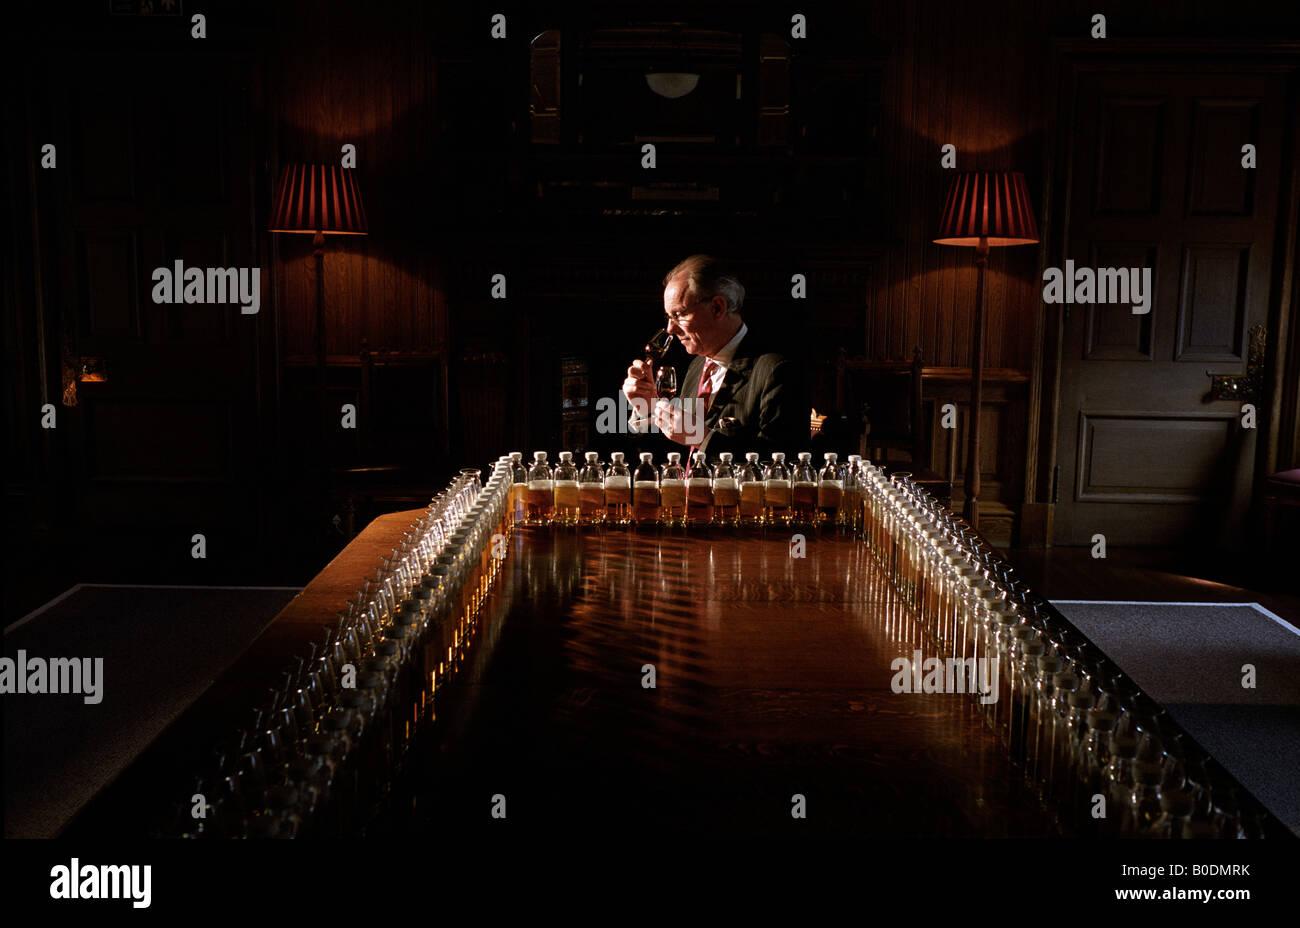 COLIN SCOTT MASTER BLENDER STRATHISLA DISTILLERY WHISKY SCOTLAND PERNOD RICARD CHIVAS REGAL BANFFSHIRE HIGHLANDS Stock Photo